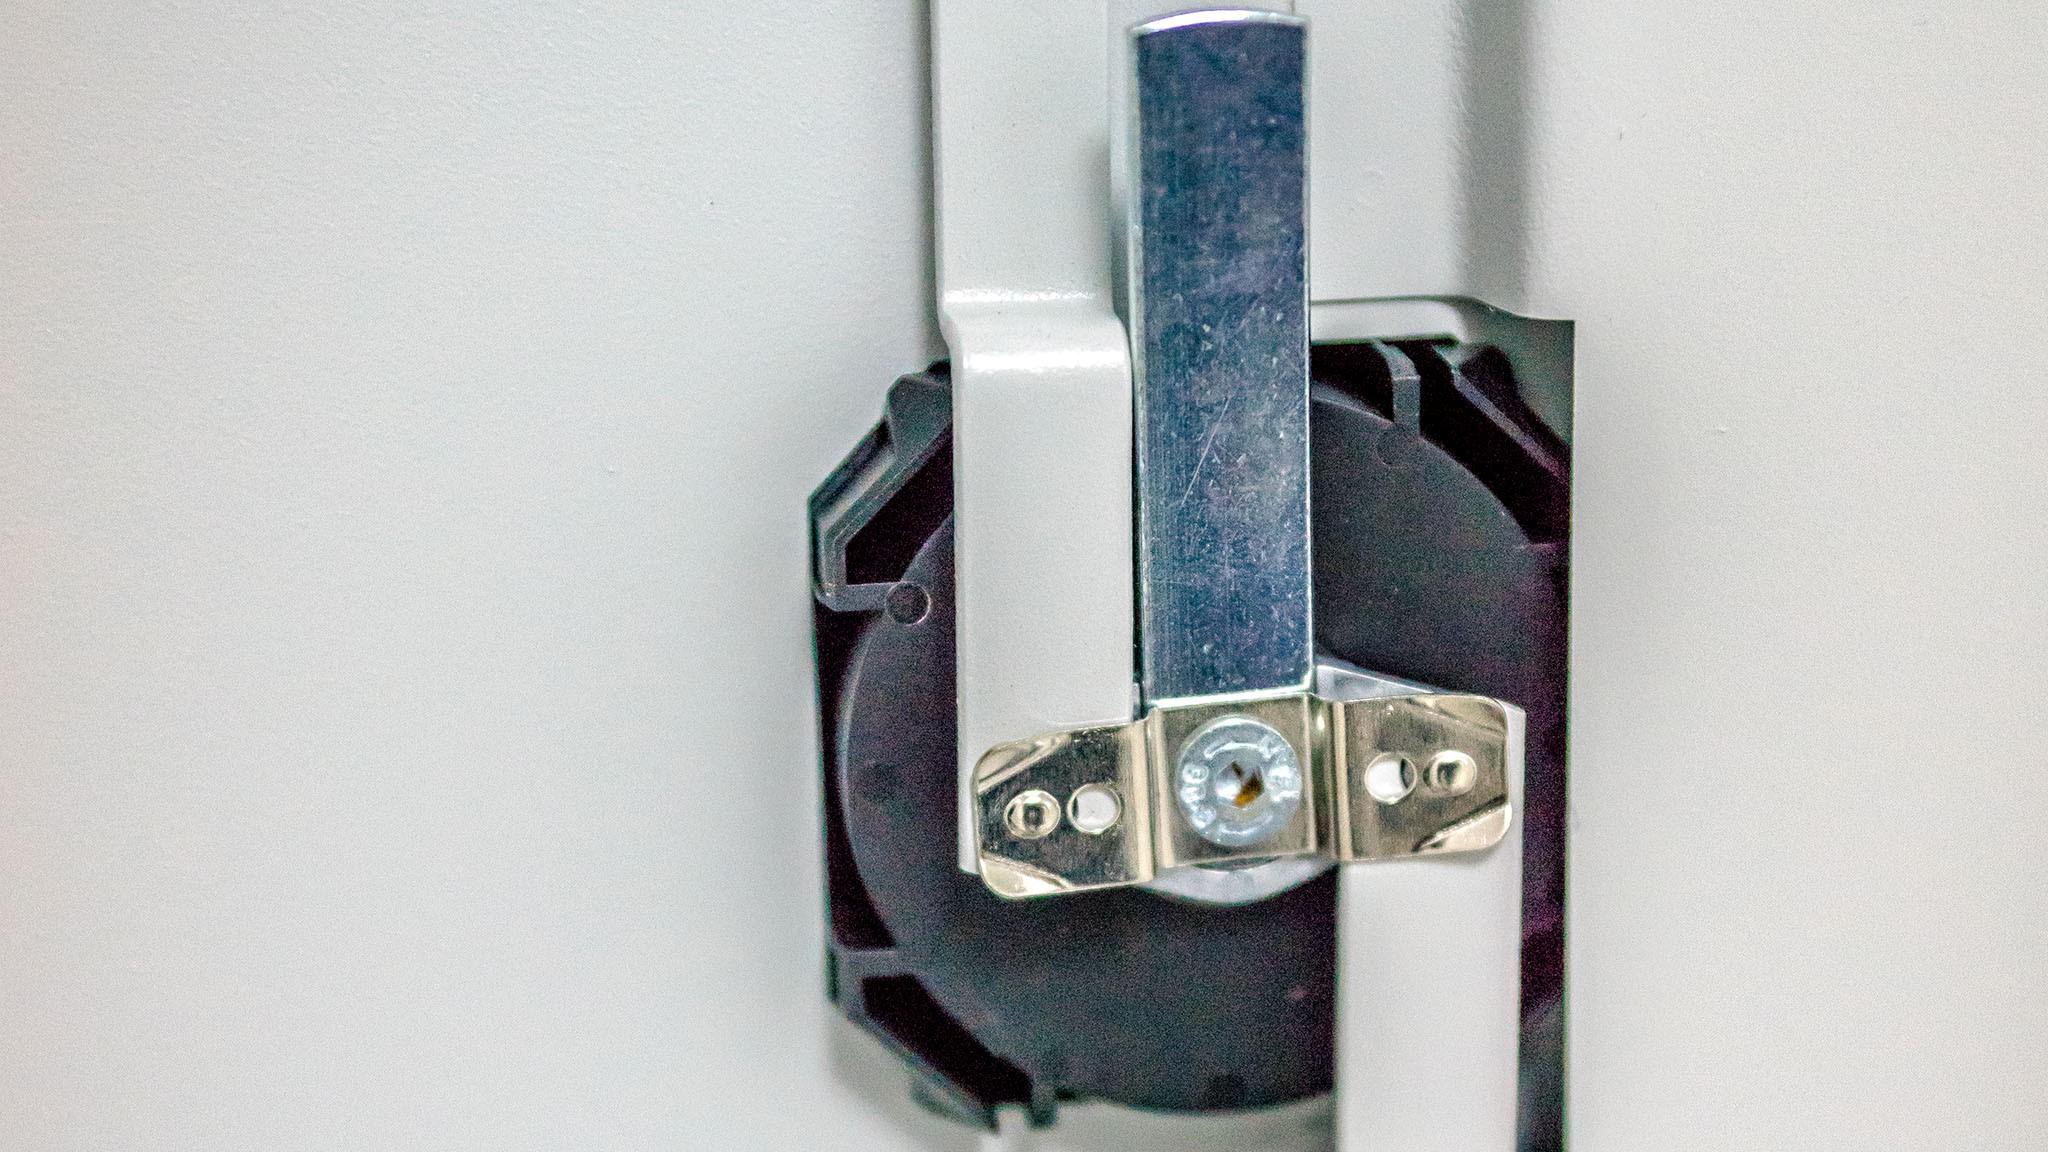 Krupni plan mehanizma brave metalnog arhivskog ormana